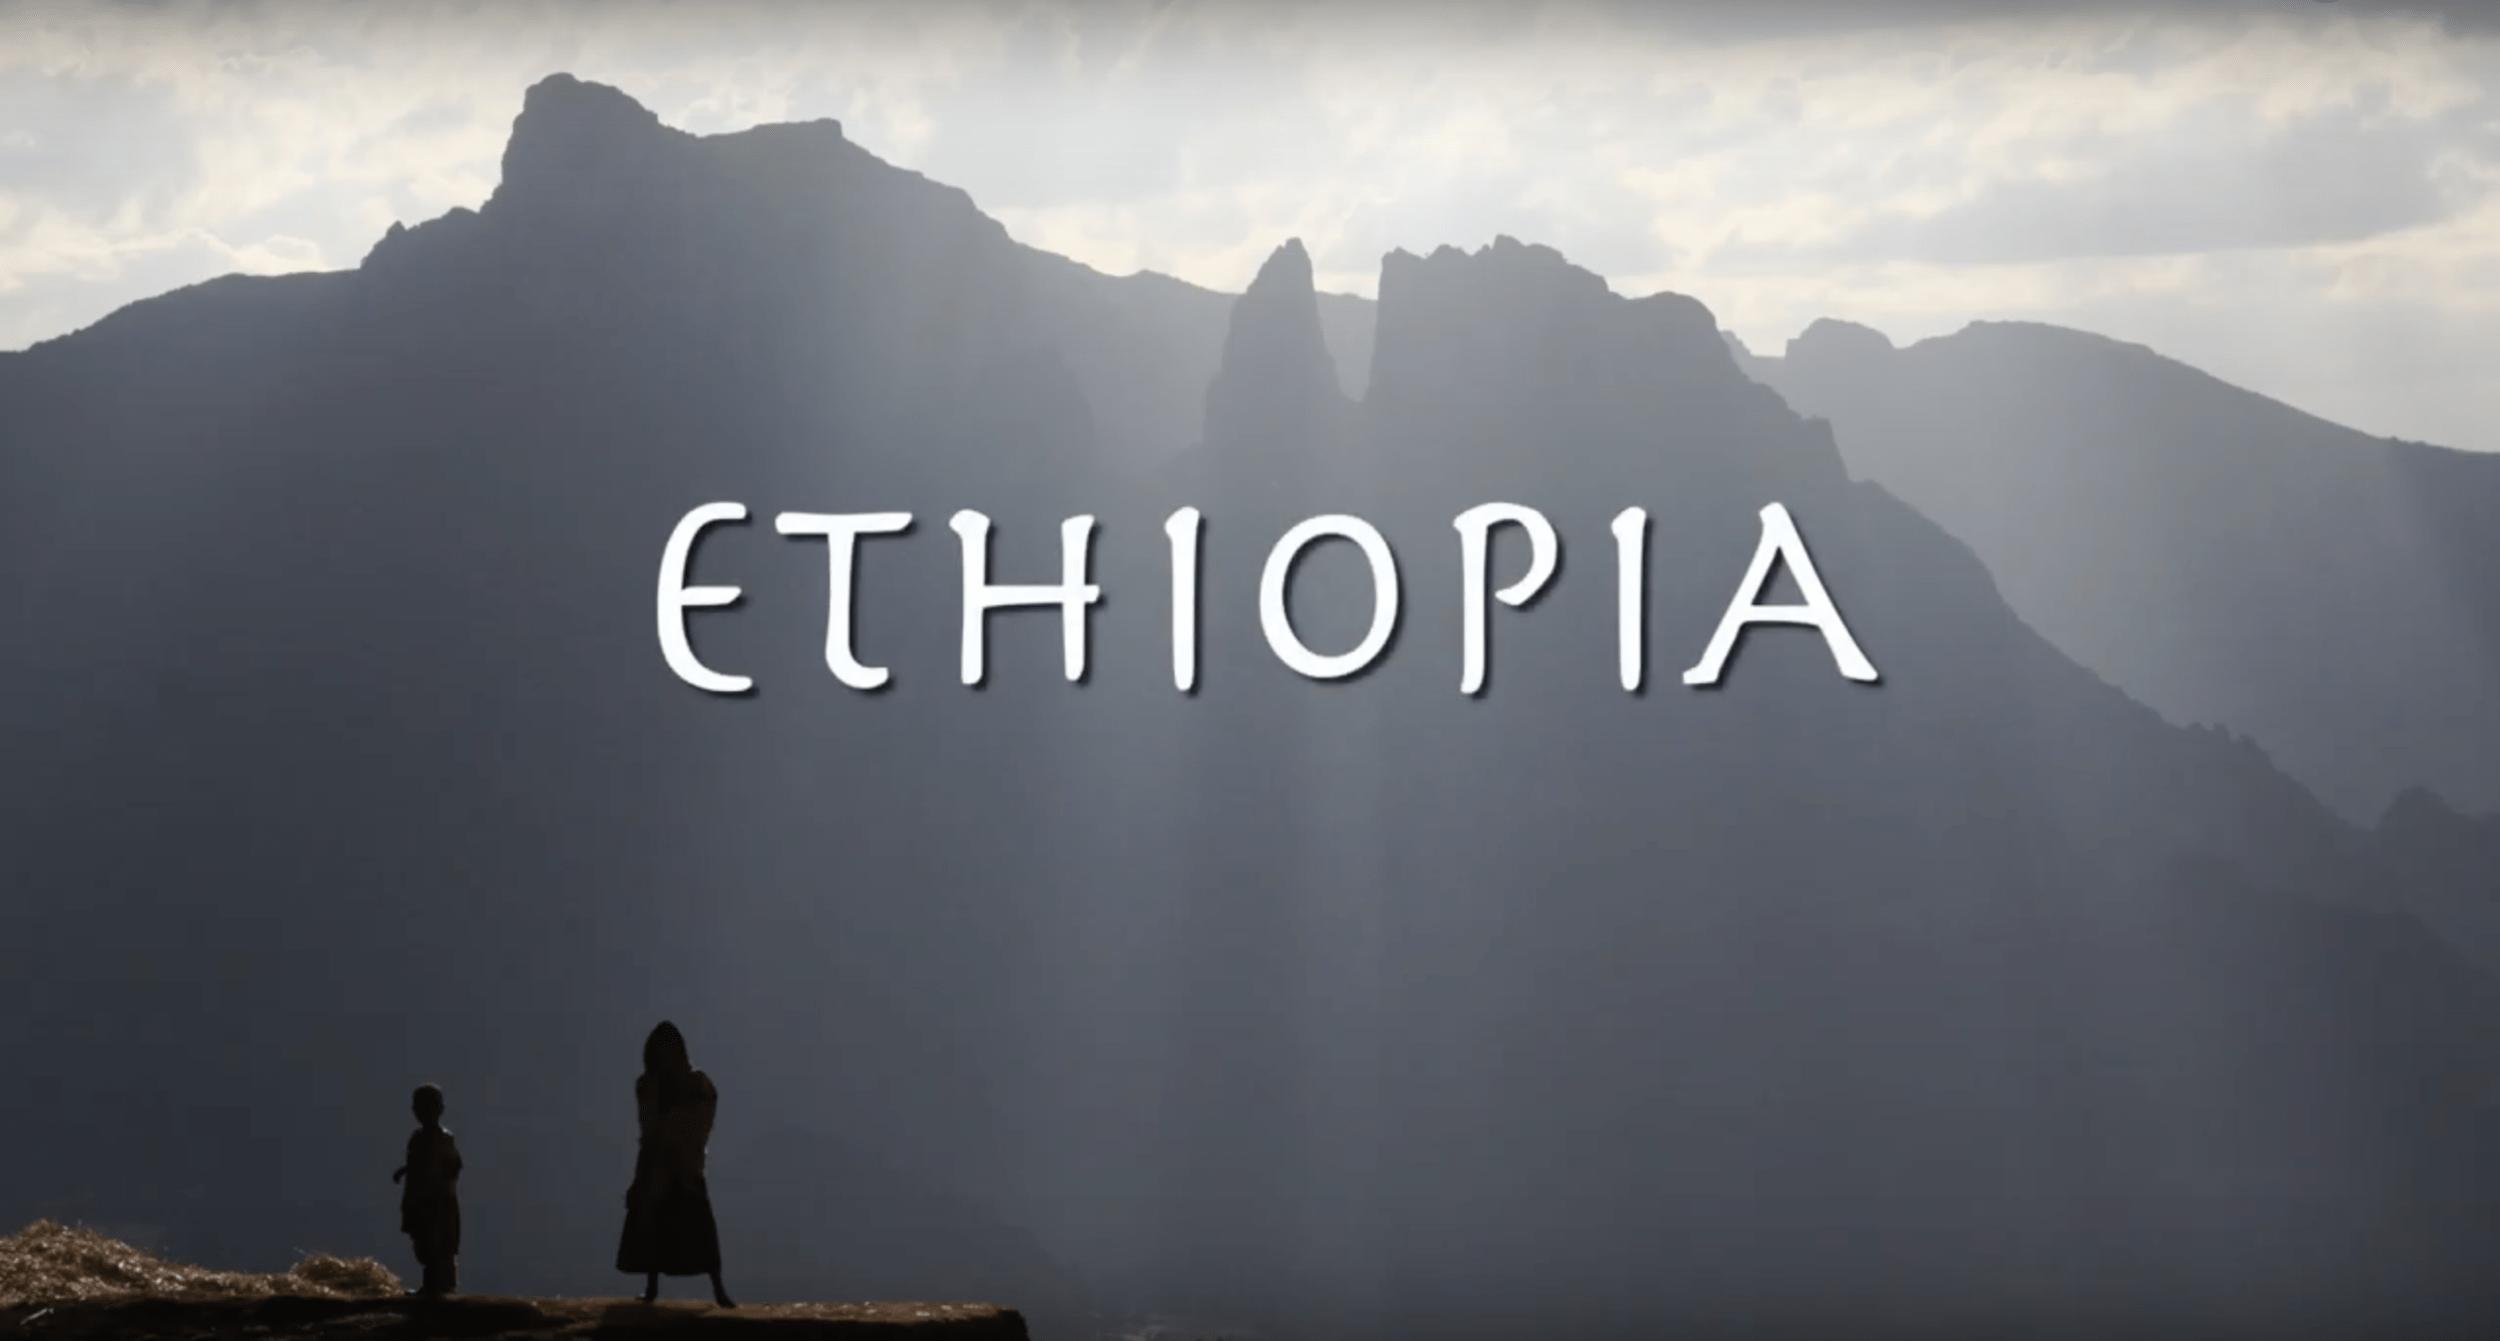 Celebrating Ethiopia's agricultural transformation - CGIAR